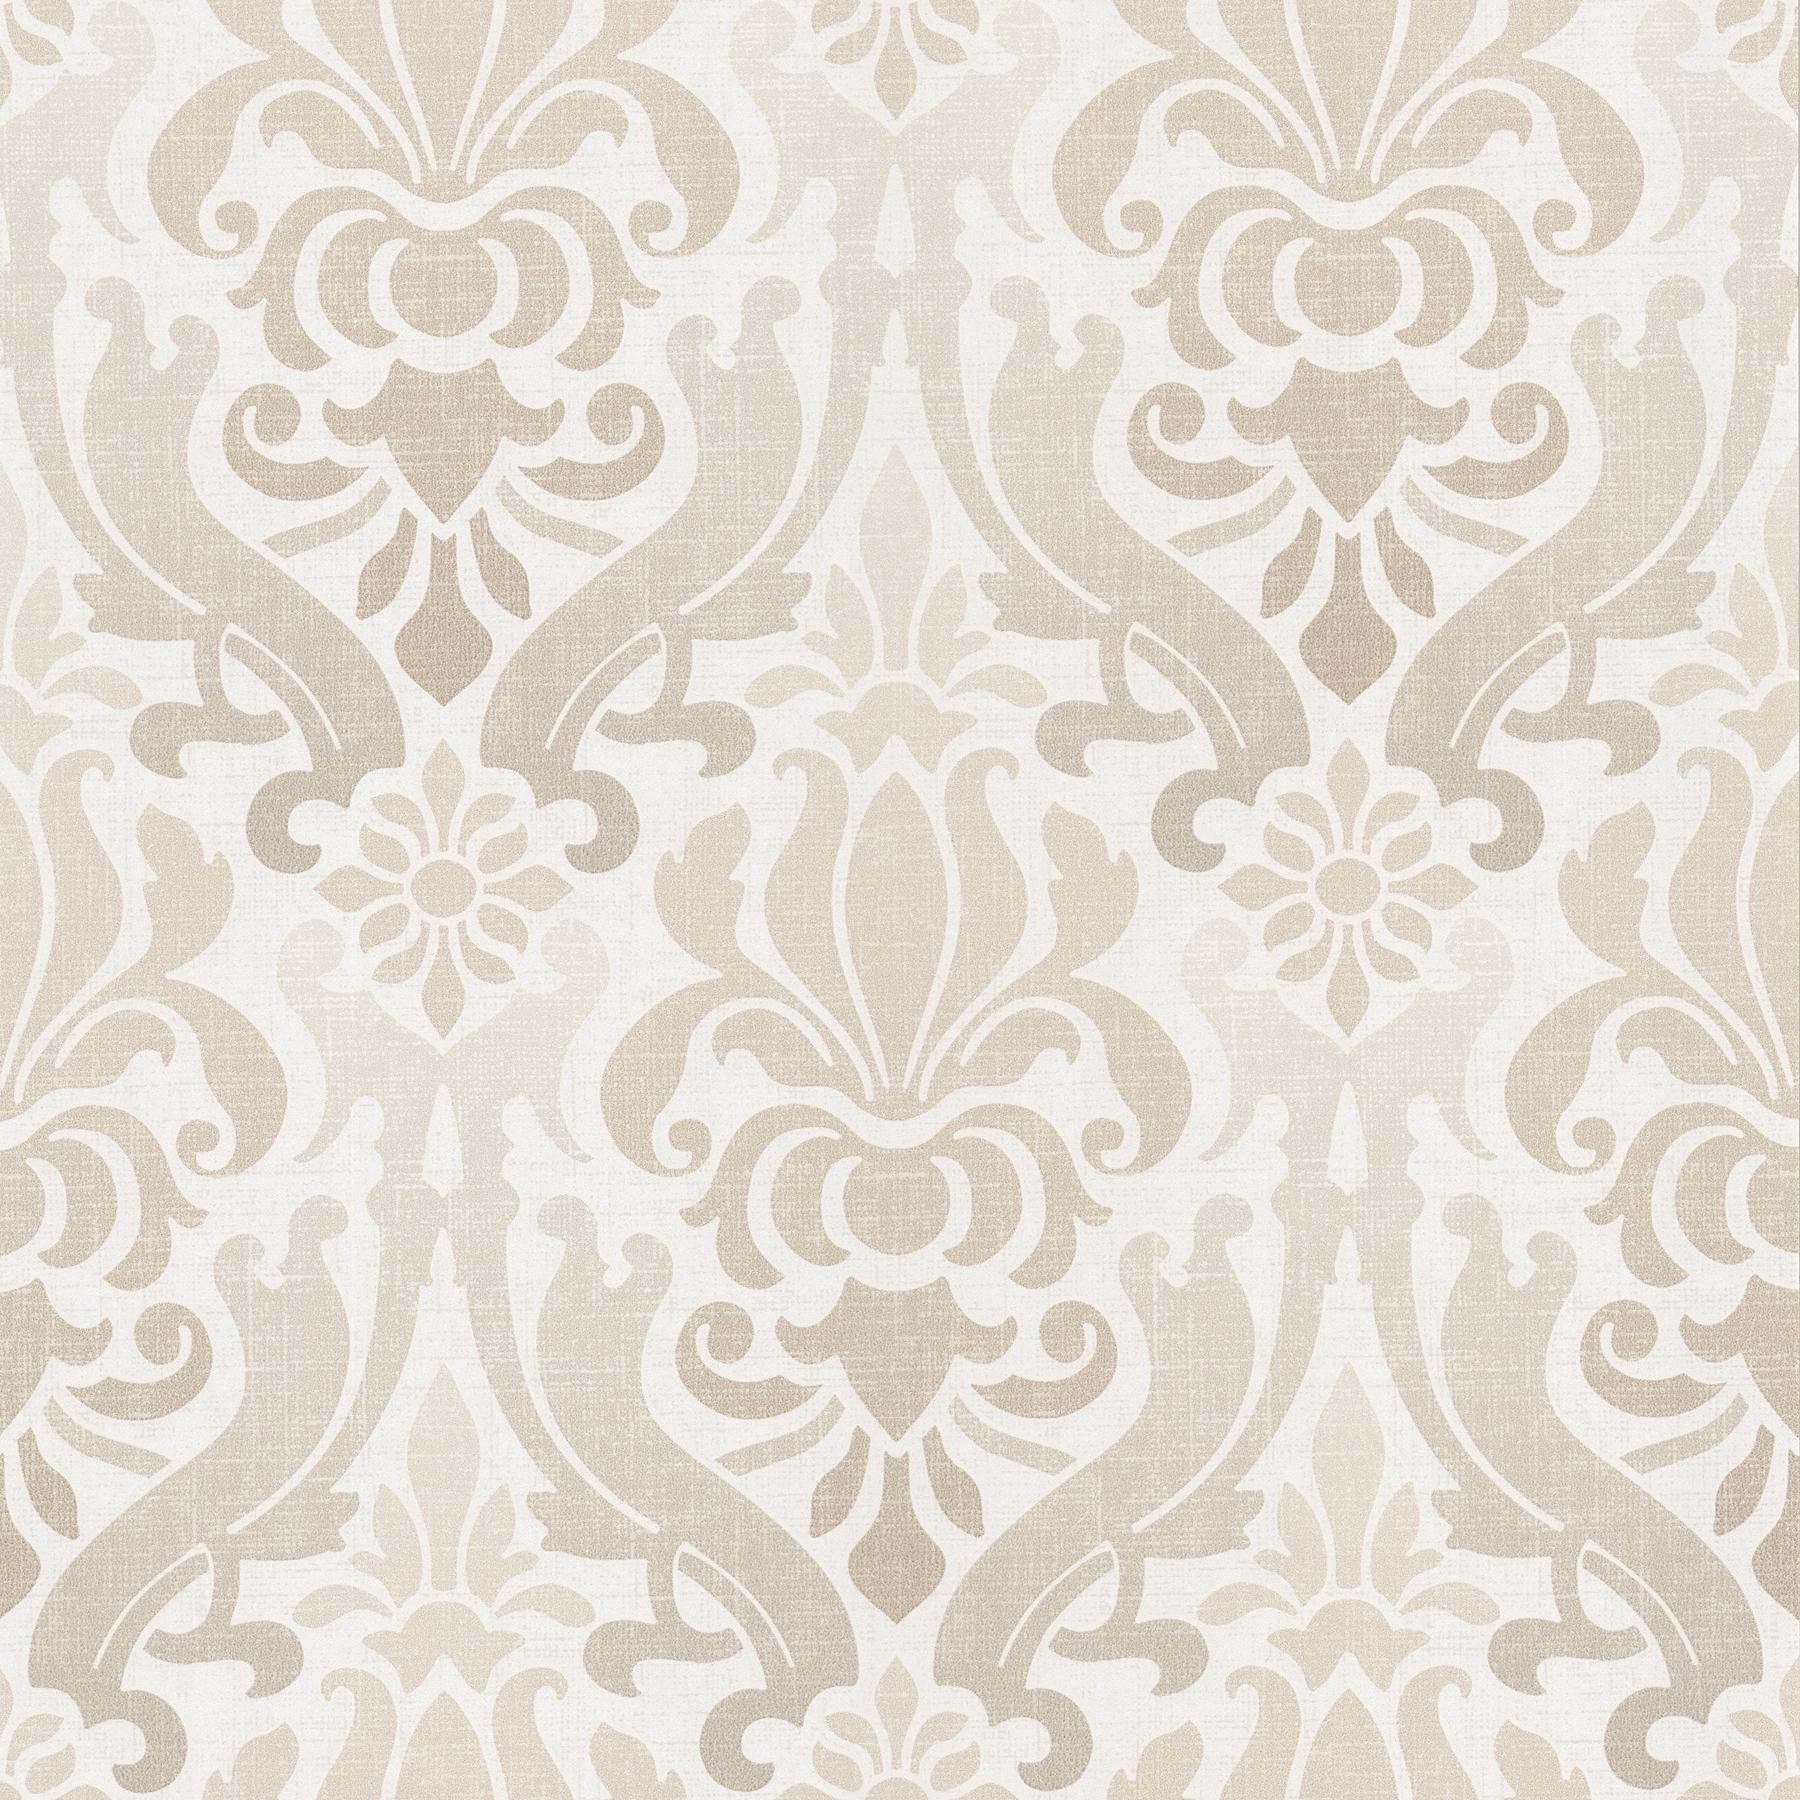 Picture of Aquitaine Cream Nouveau Damask Wallpaper